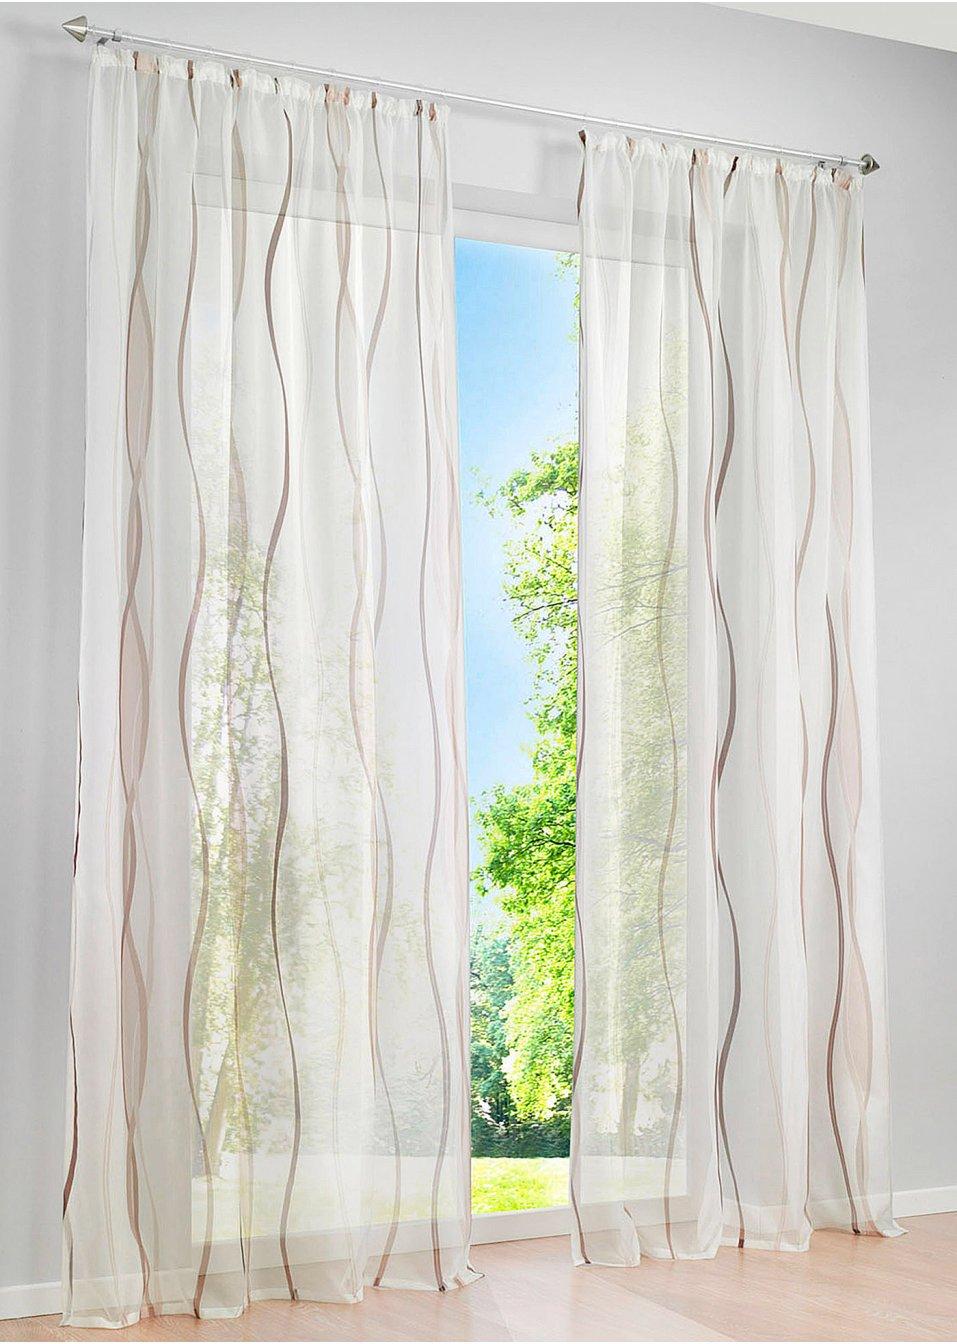 luftig leichte gardine vienna in transparenter optik creme braun kr uselband 1er pack. Black Bedroom Furniture Sets. Home Design Ideas